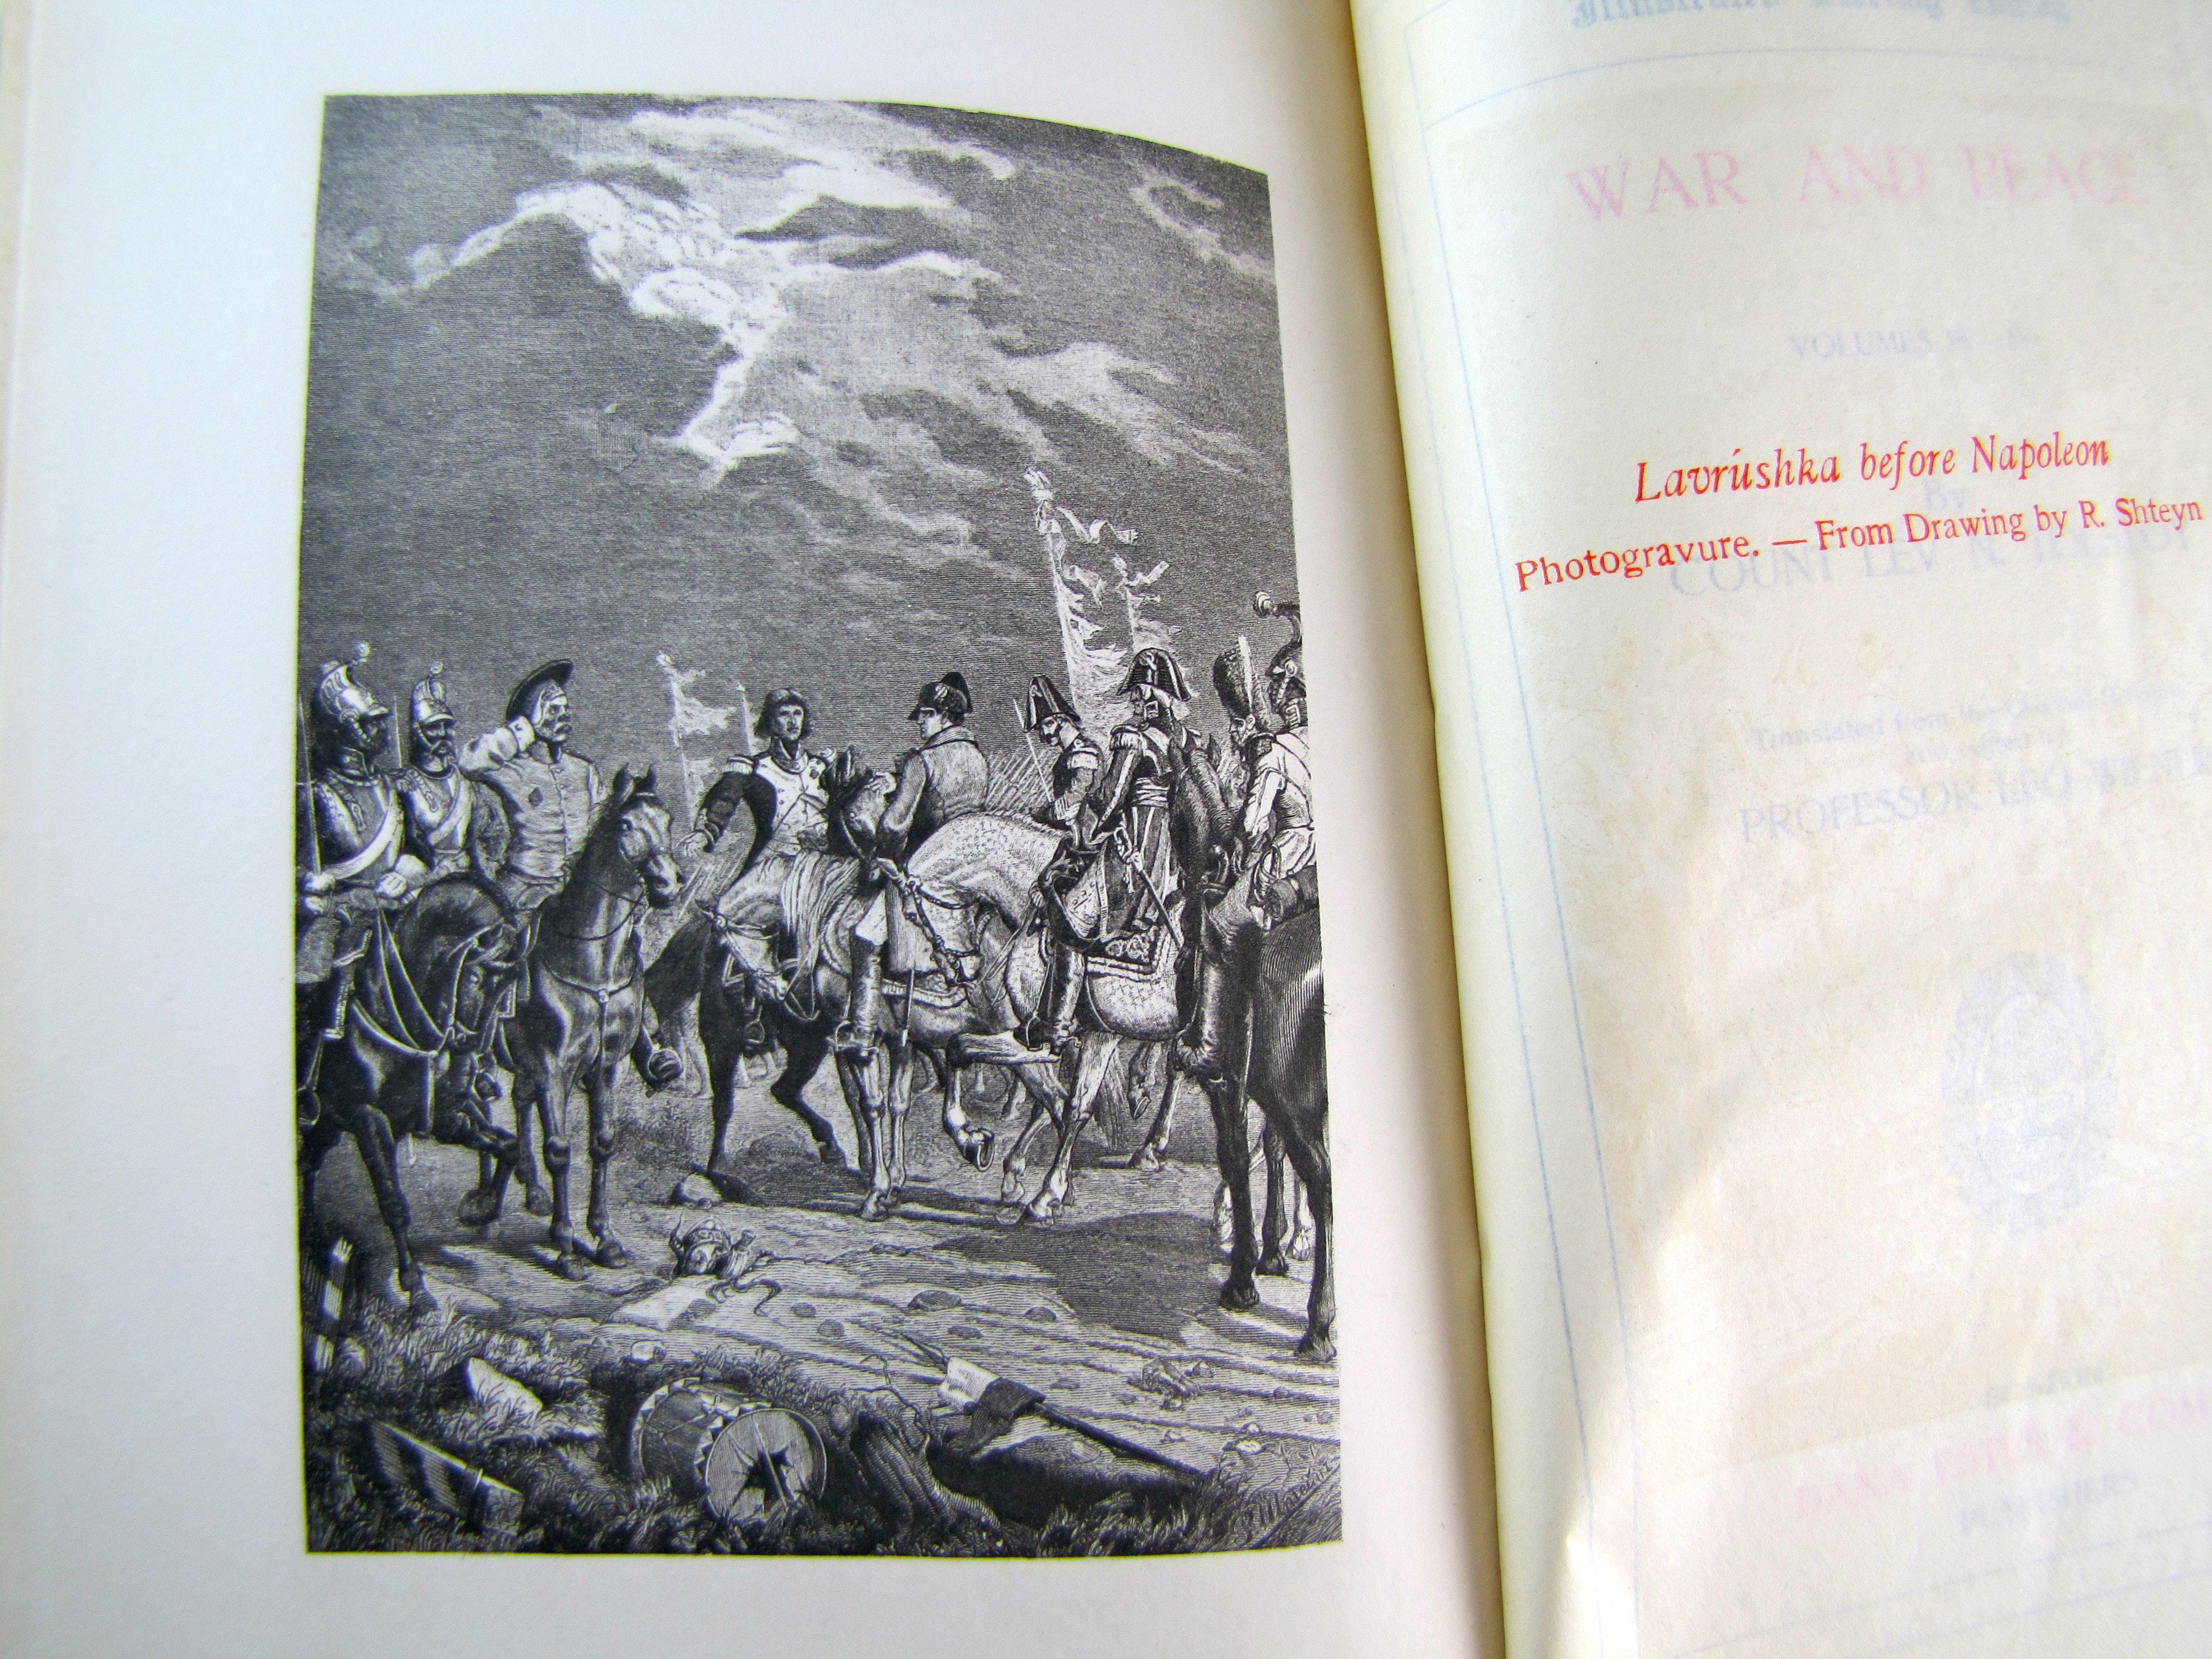 tolstoy hindu personals Illuminatus - illuminatus trilogy robert shea and robert school stanford course title cs 50.